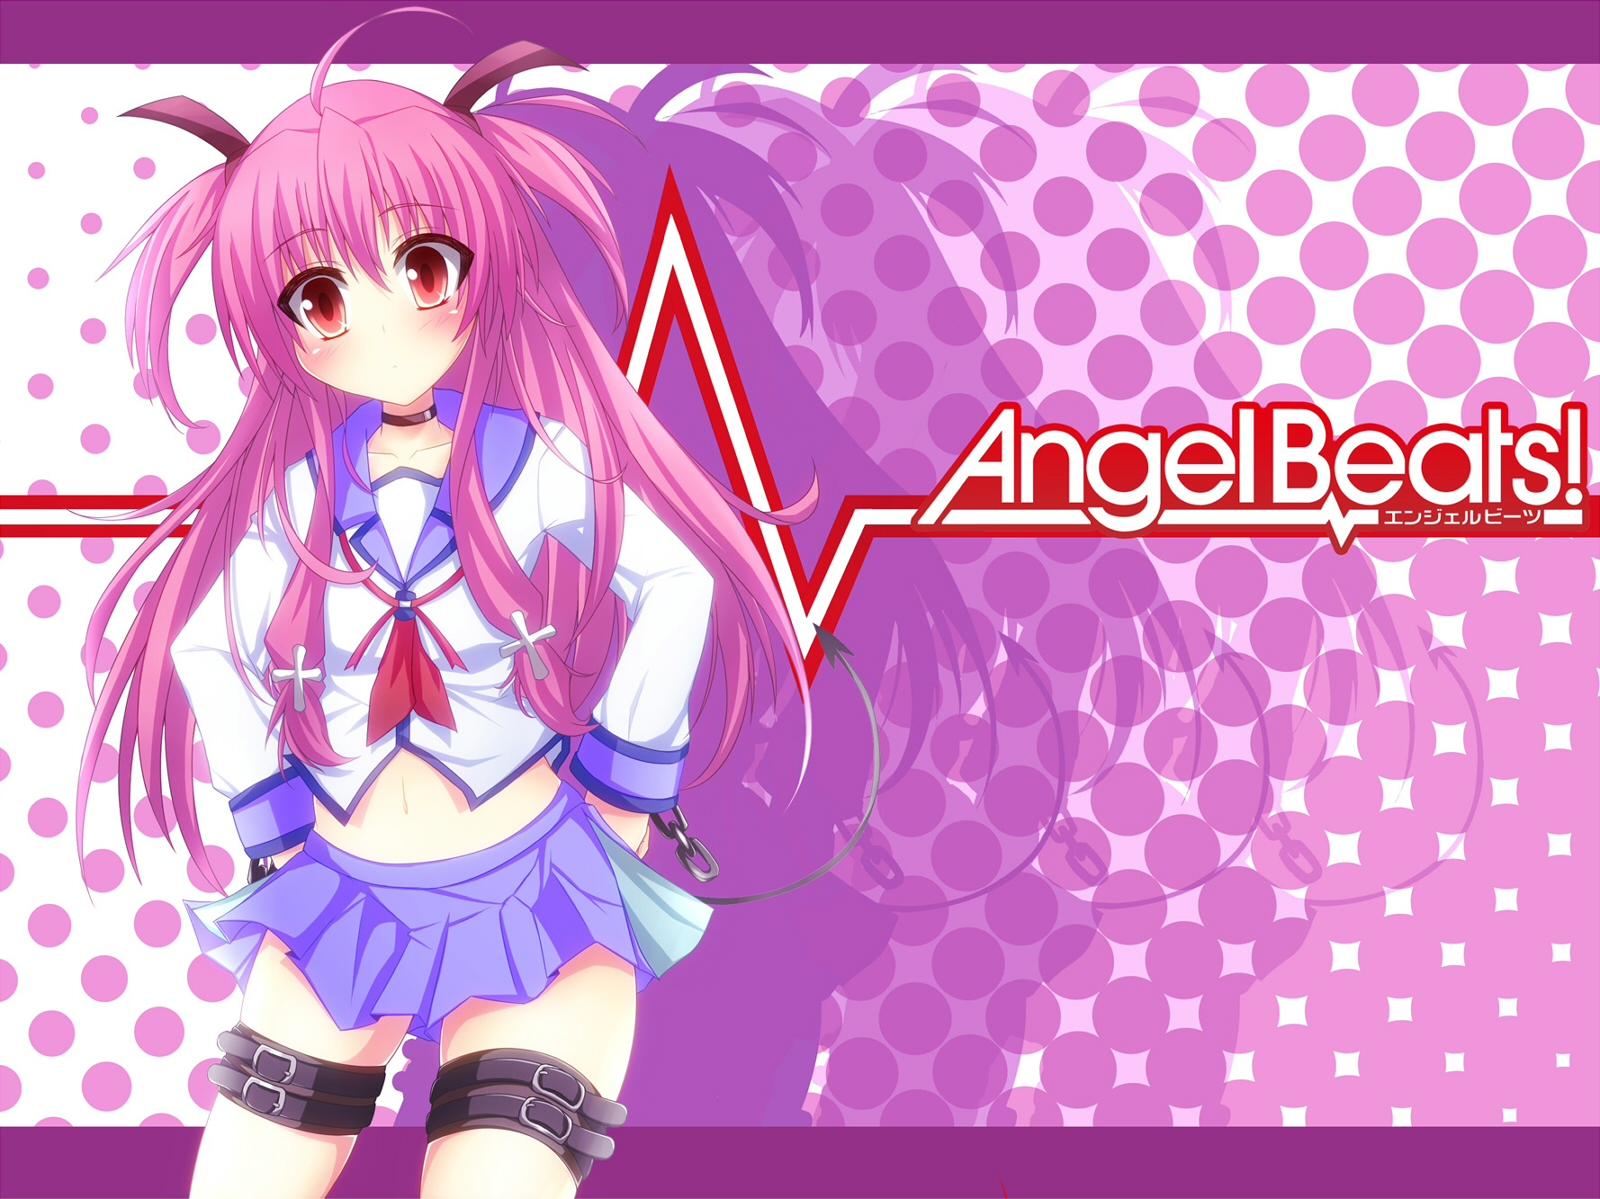 http://1.bp.blogspot.com/-f3WD6O3F1Io/UFNfNS5ZtEI/AAAAAAAAJVU/QfEasduNbcw/s1600/%5BanimesYUKINOTENSHI%5Dangel+beats+wallpaper+10.jpg